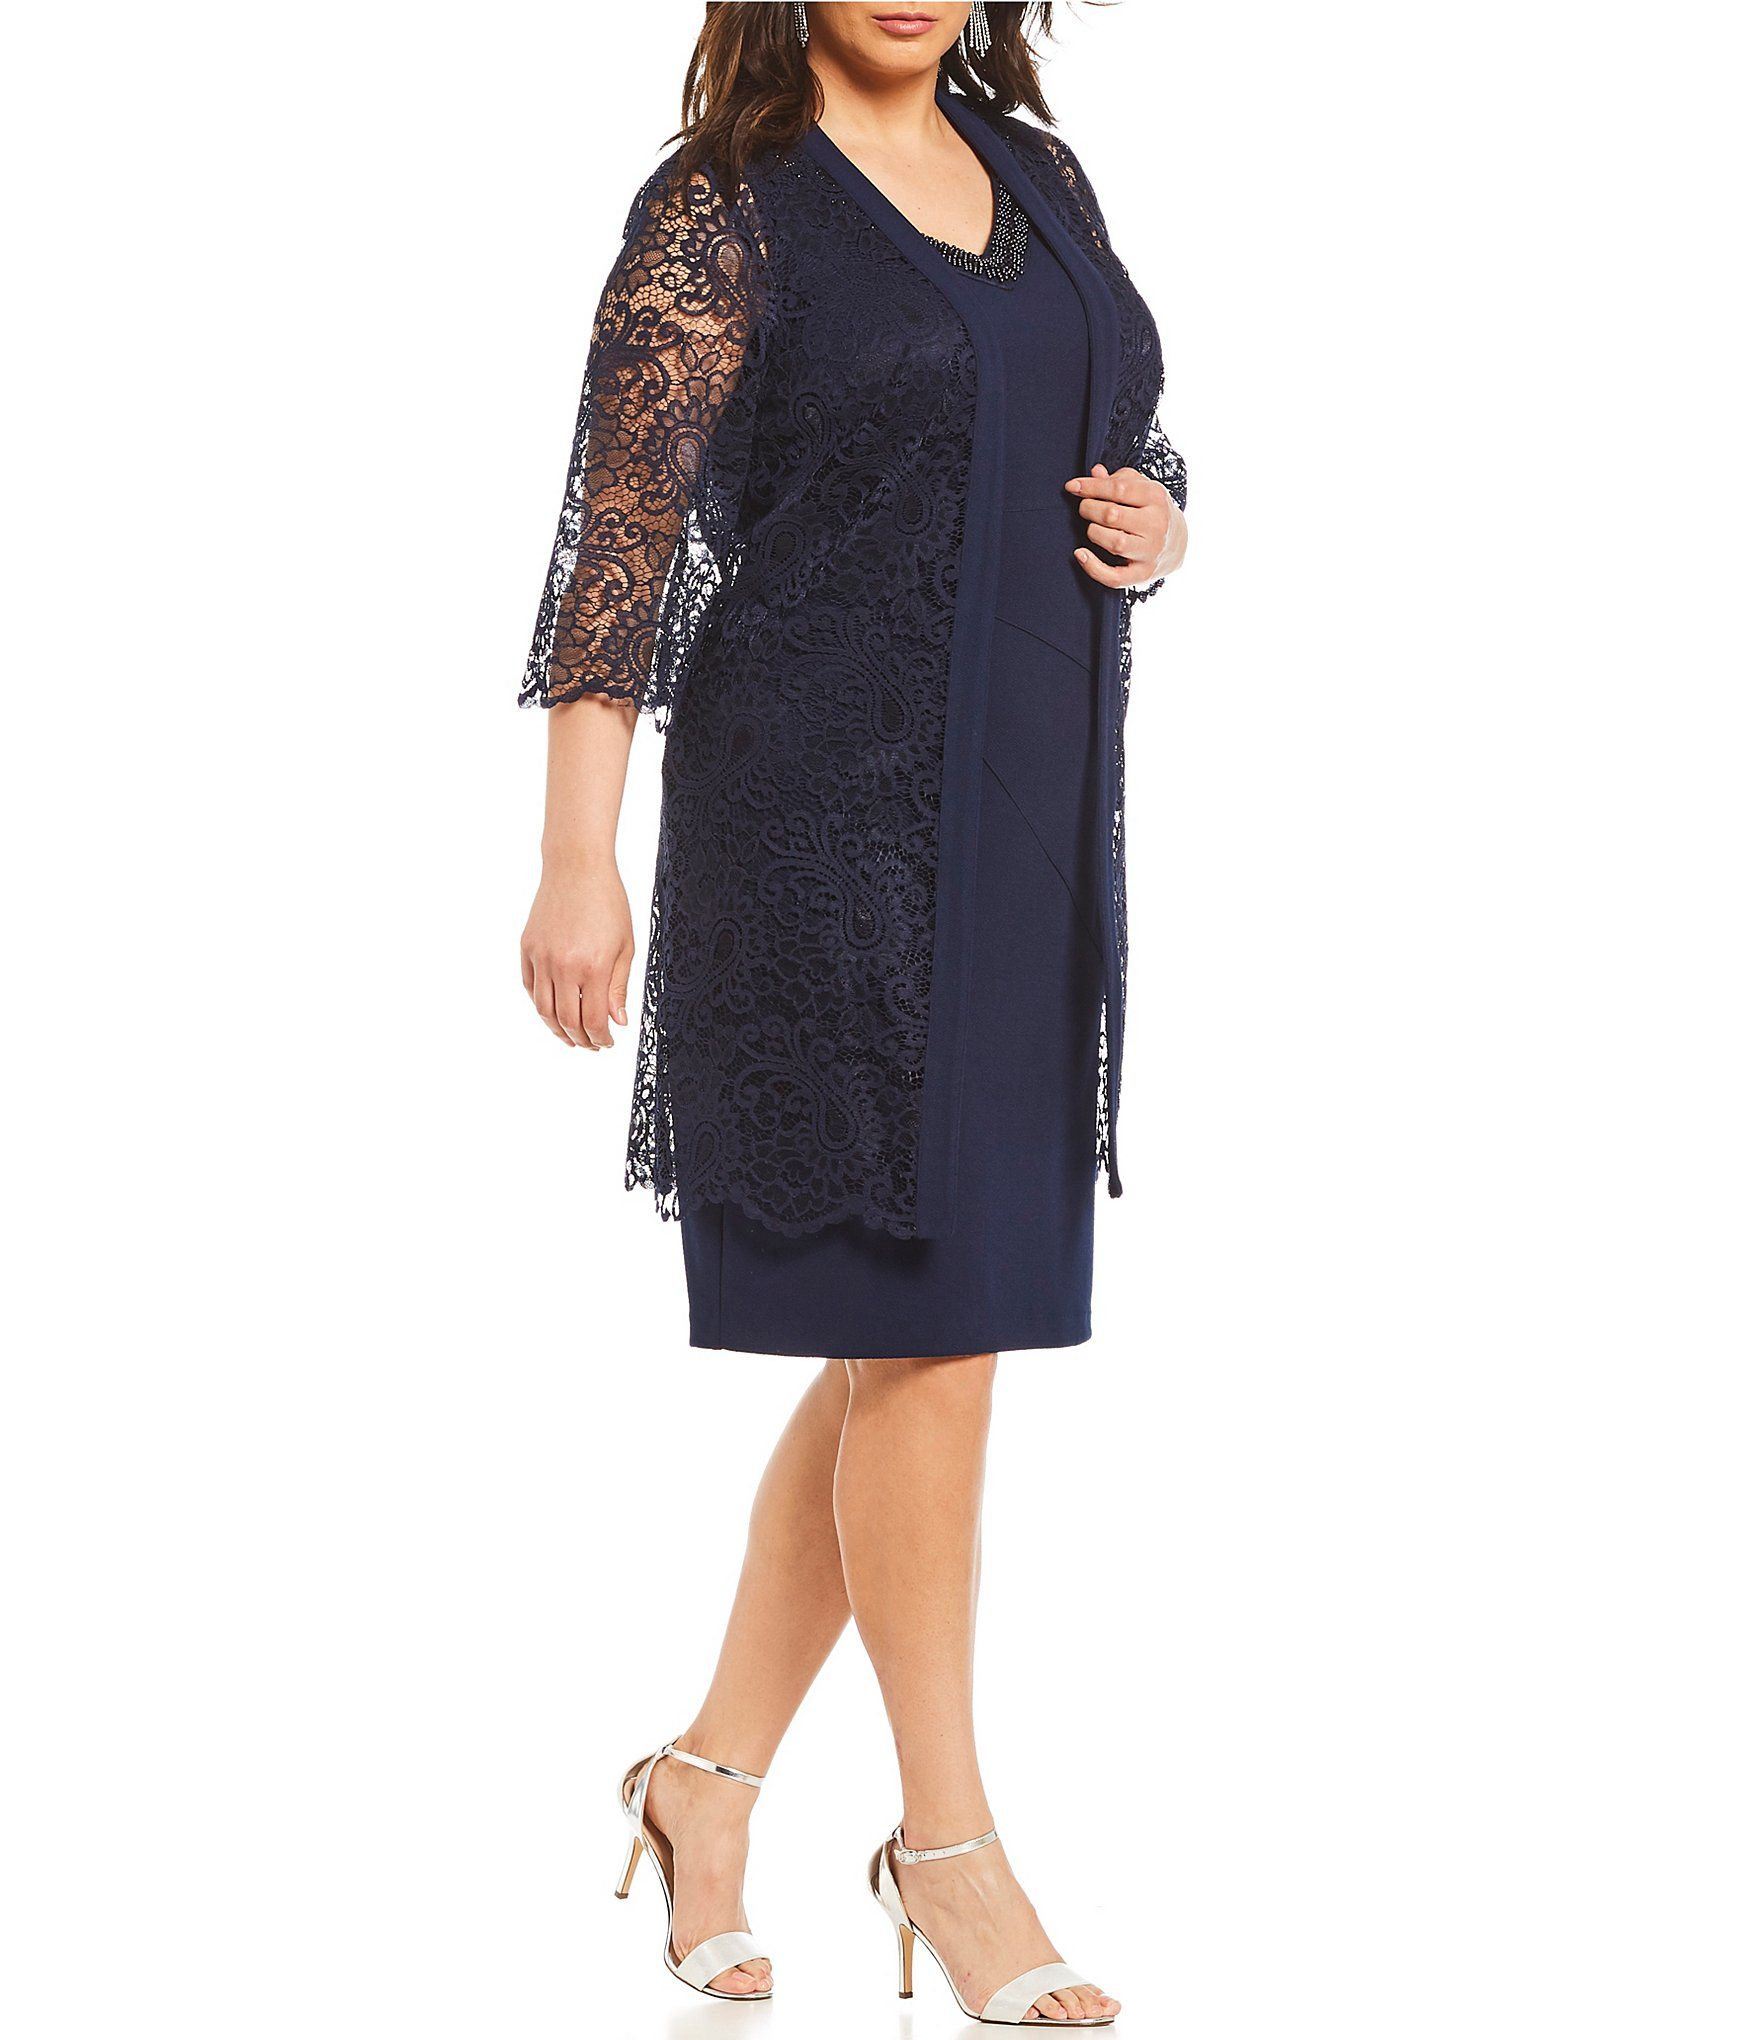 84e9e10f66 Le Bos Plus Size 2-Pice Lace Jacket Dress in 2019